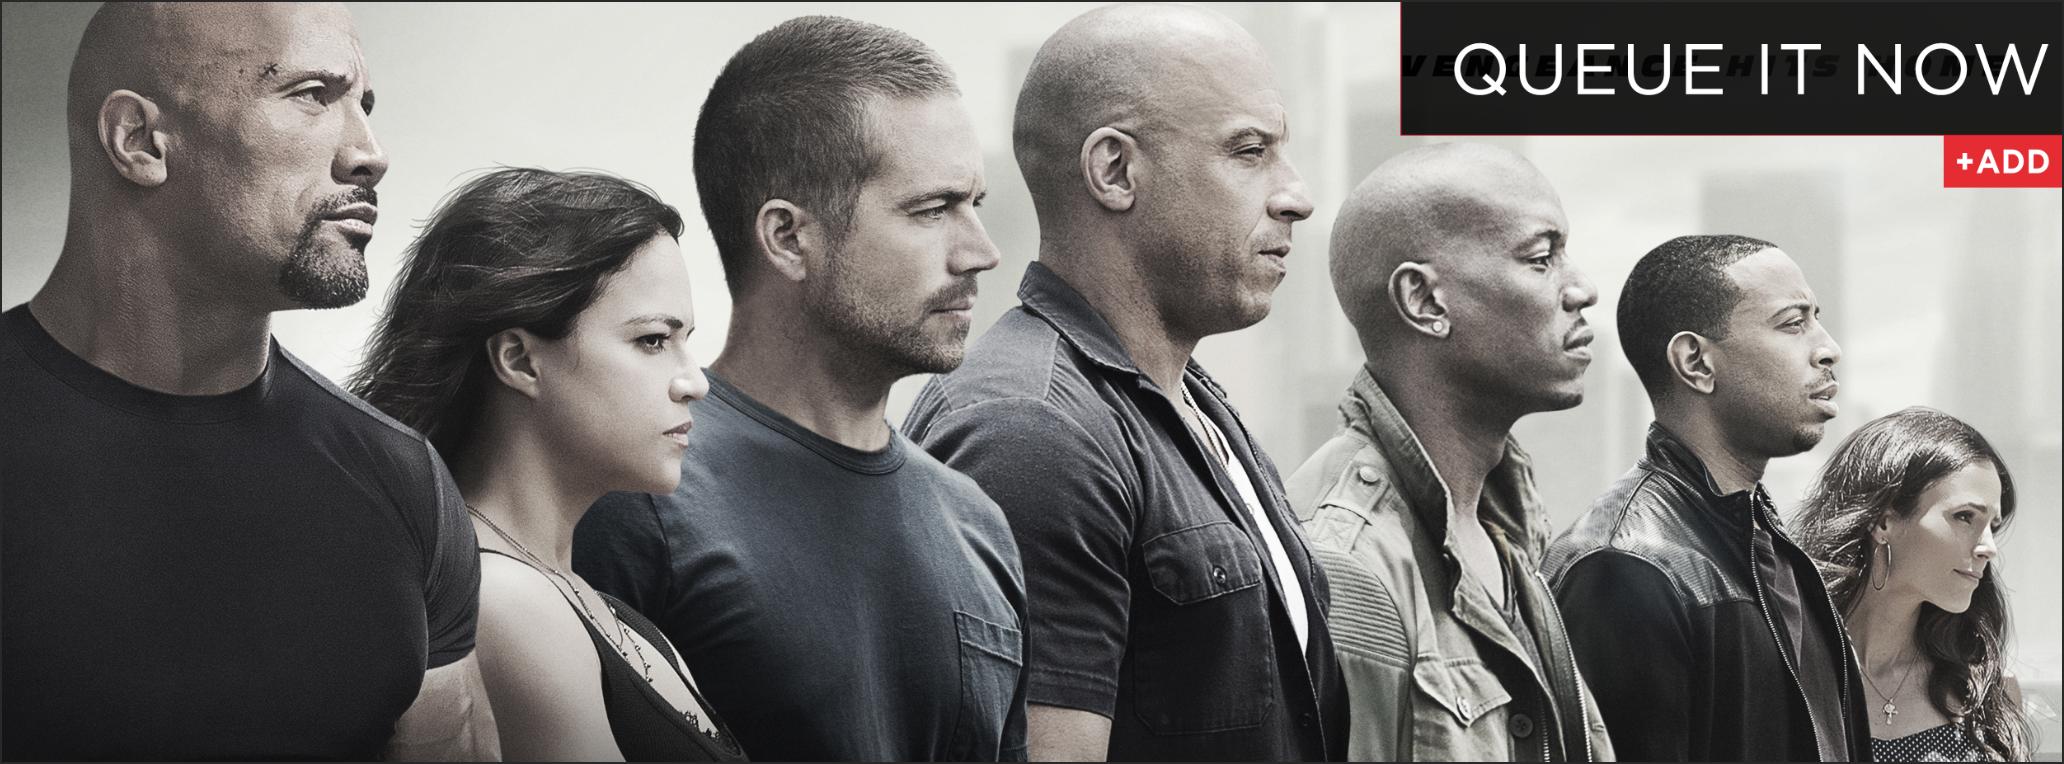 Furious 7 on DVD/Blu-ray